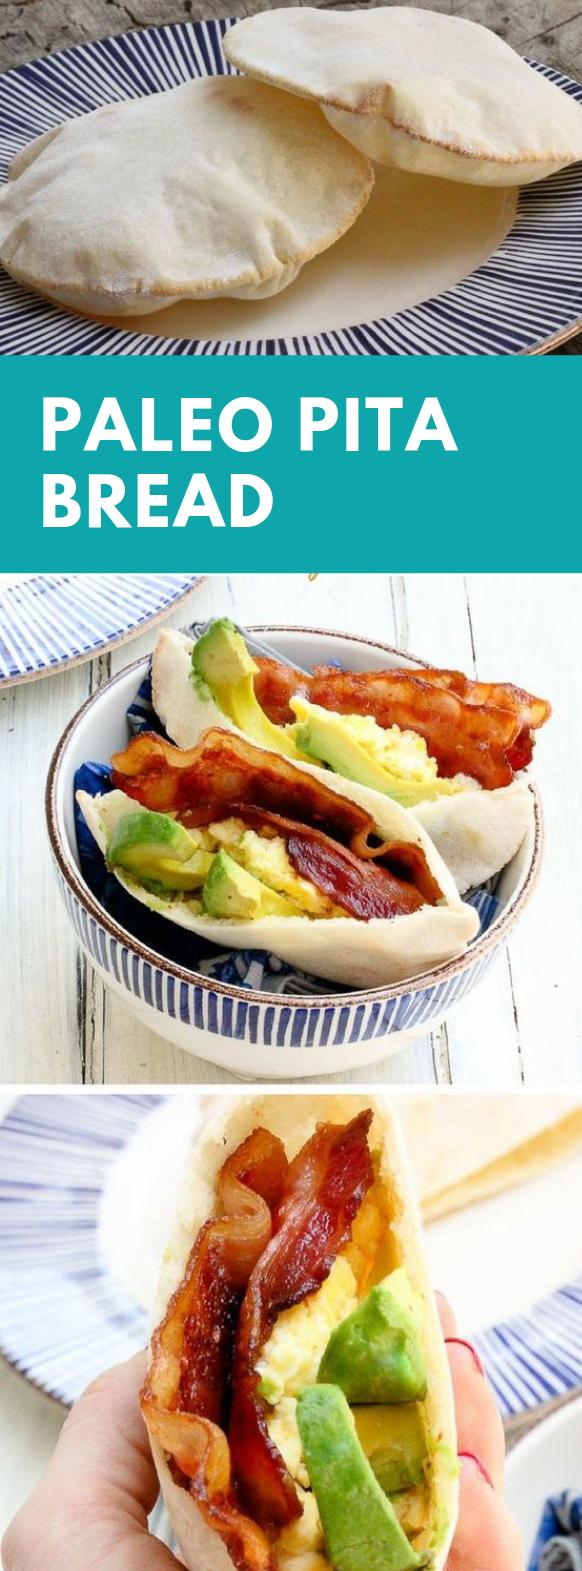 Paleo Pita Bread #diet #paleo